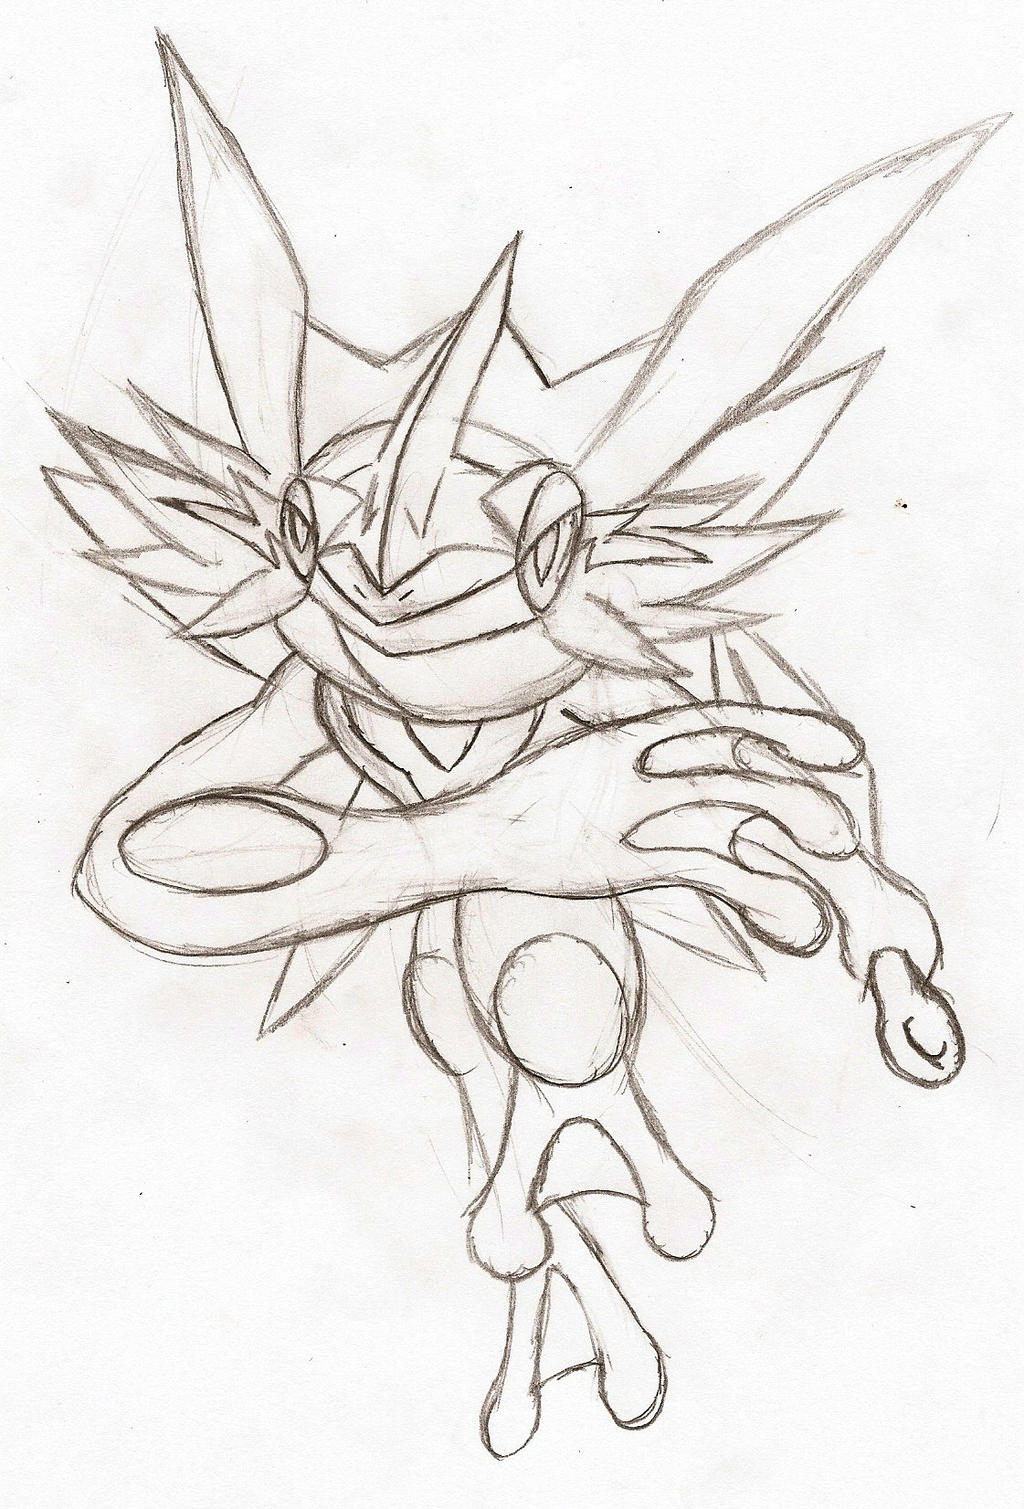 Ash-Greninja: Dash Attack! by NeonNeoz